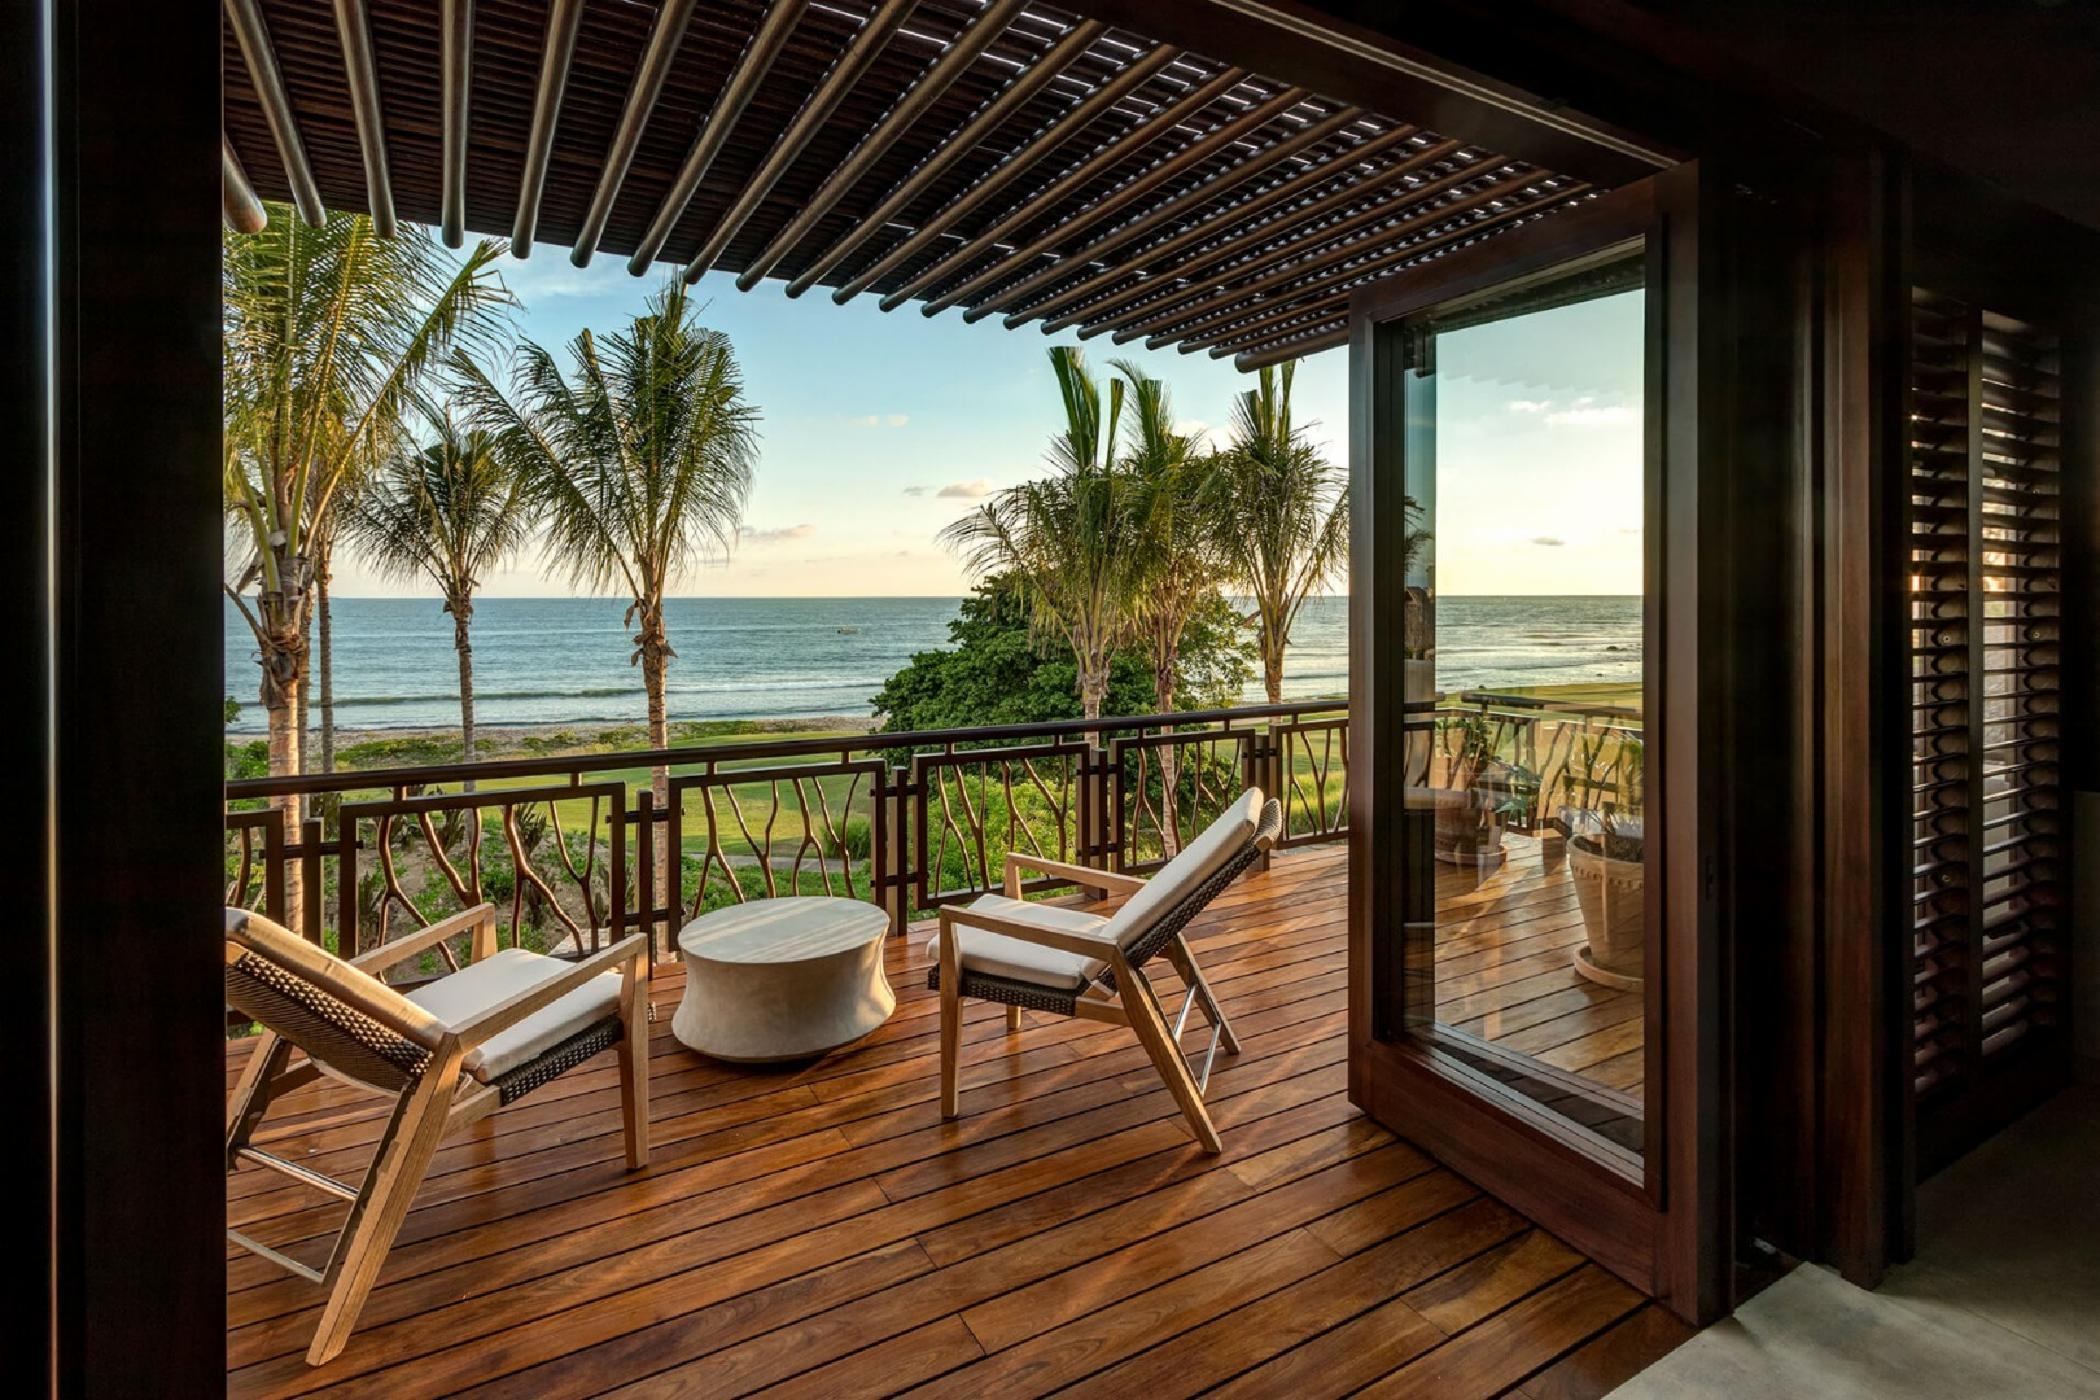 087-Sol master suite_balcony.jpg